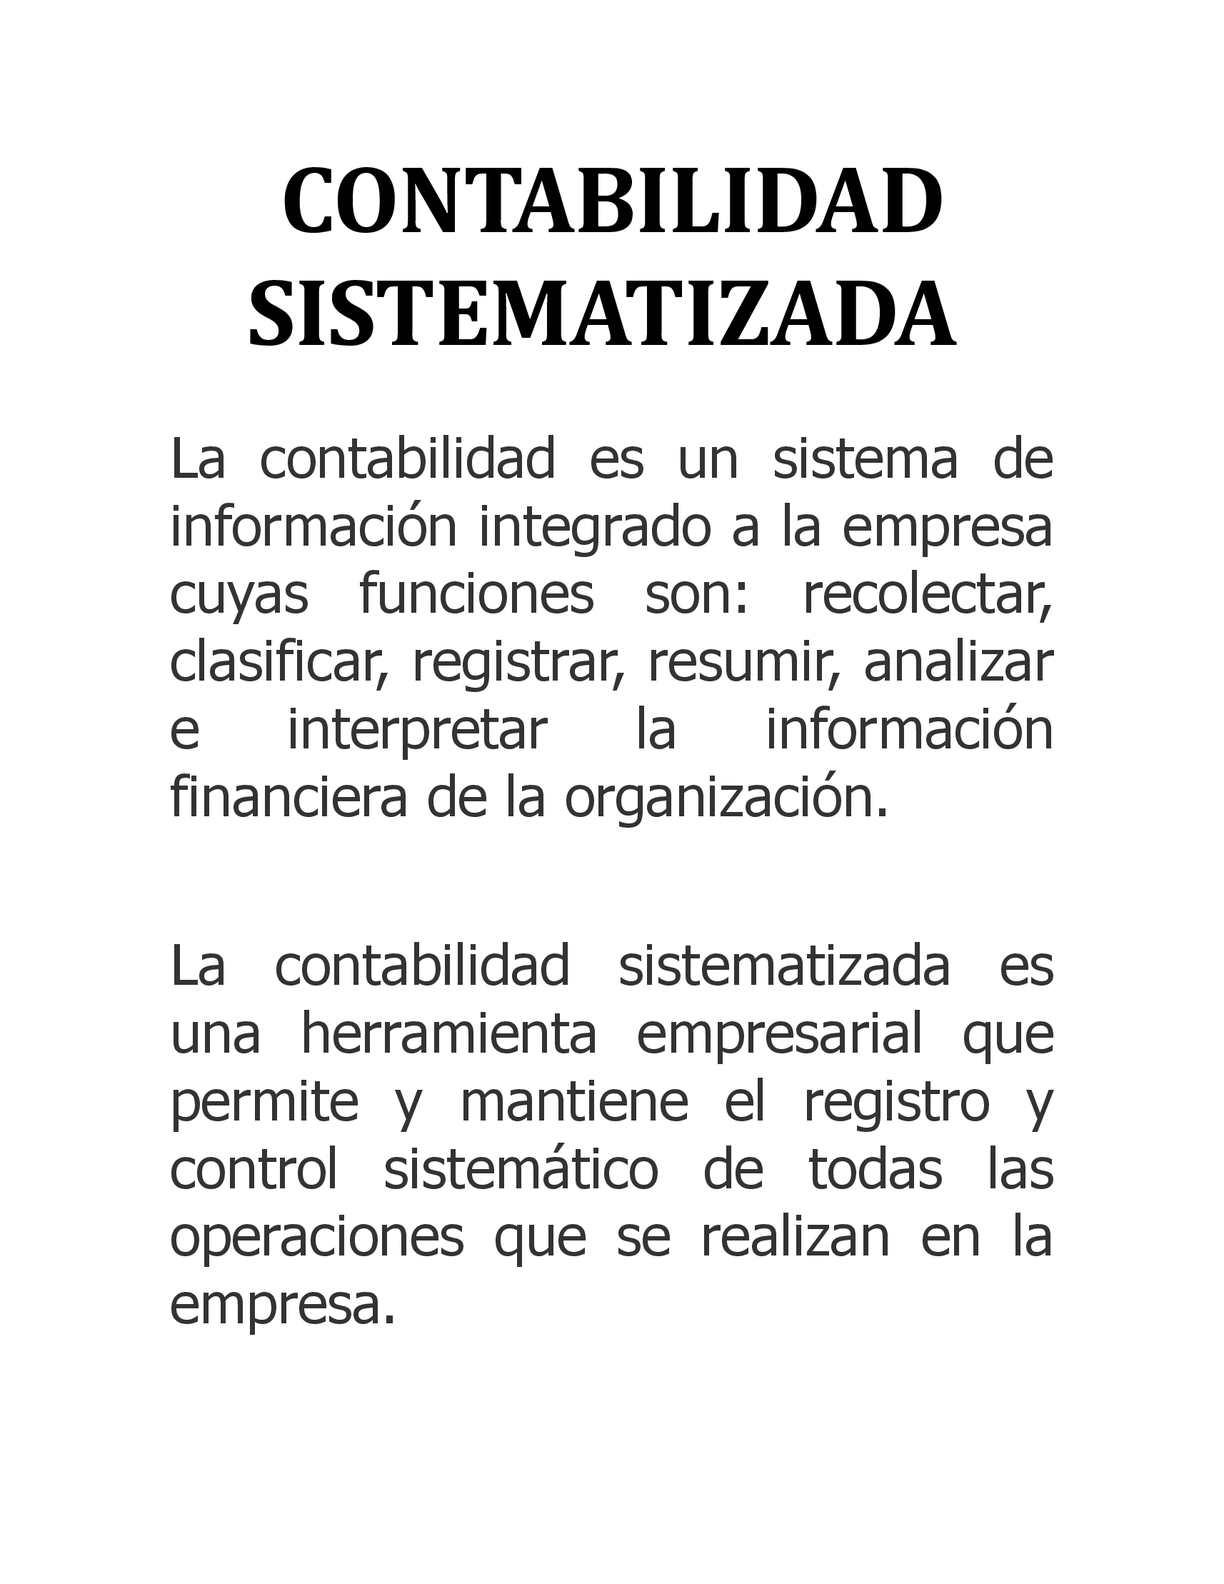 Calaméo - CONTABILIDAD SISTEMATIZADA